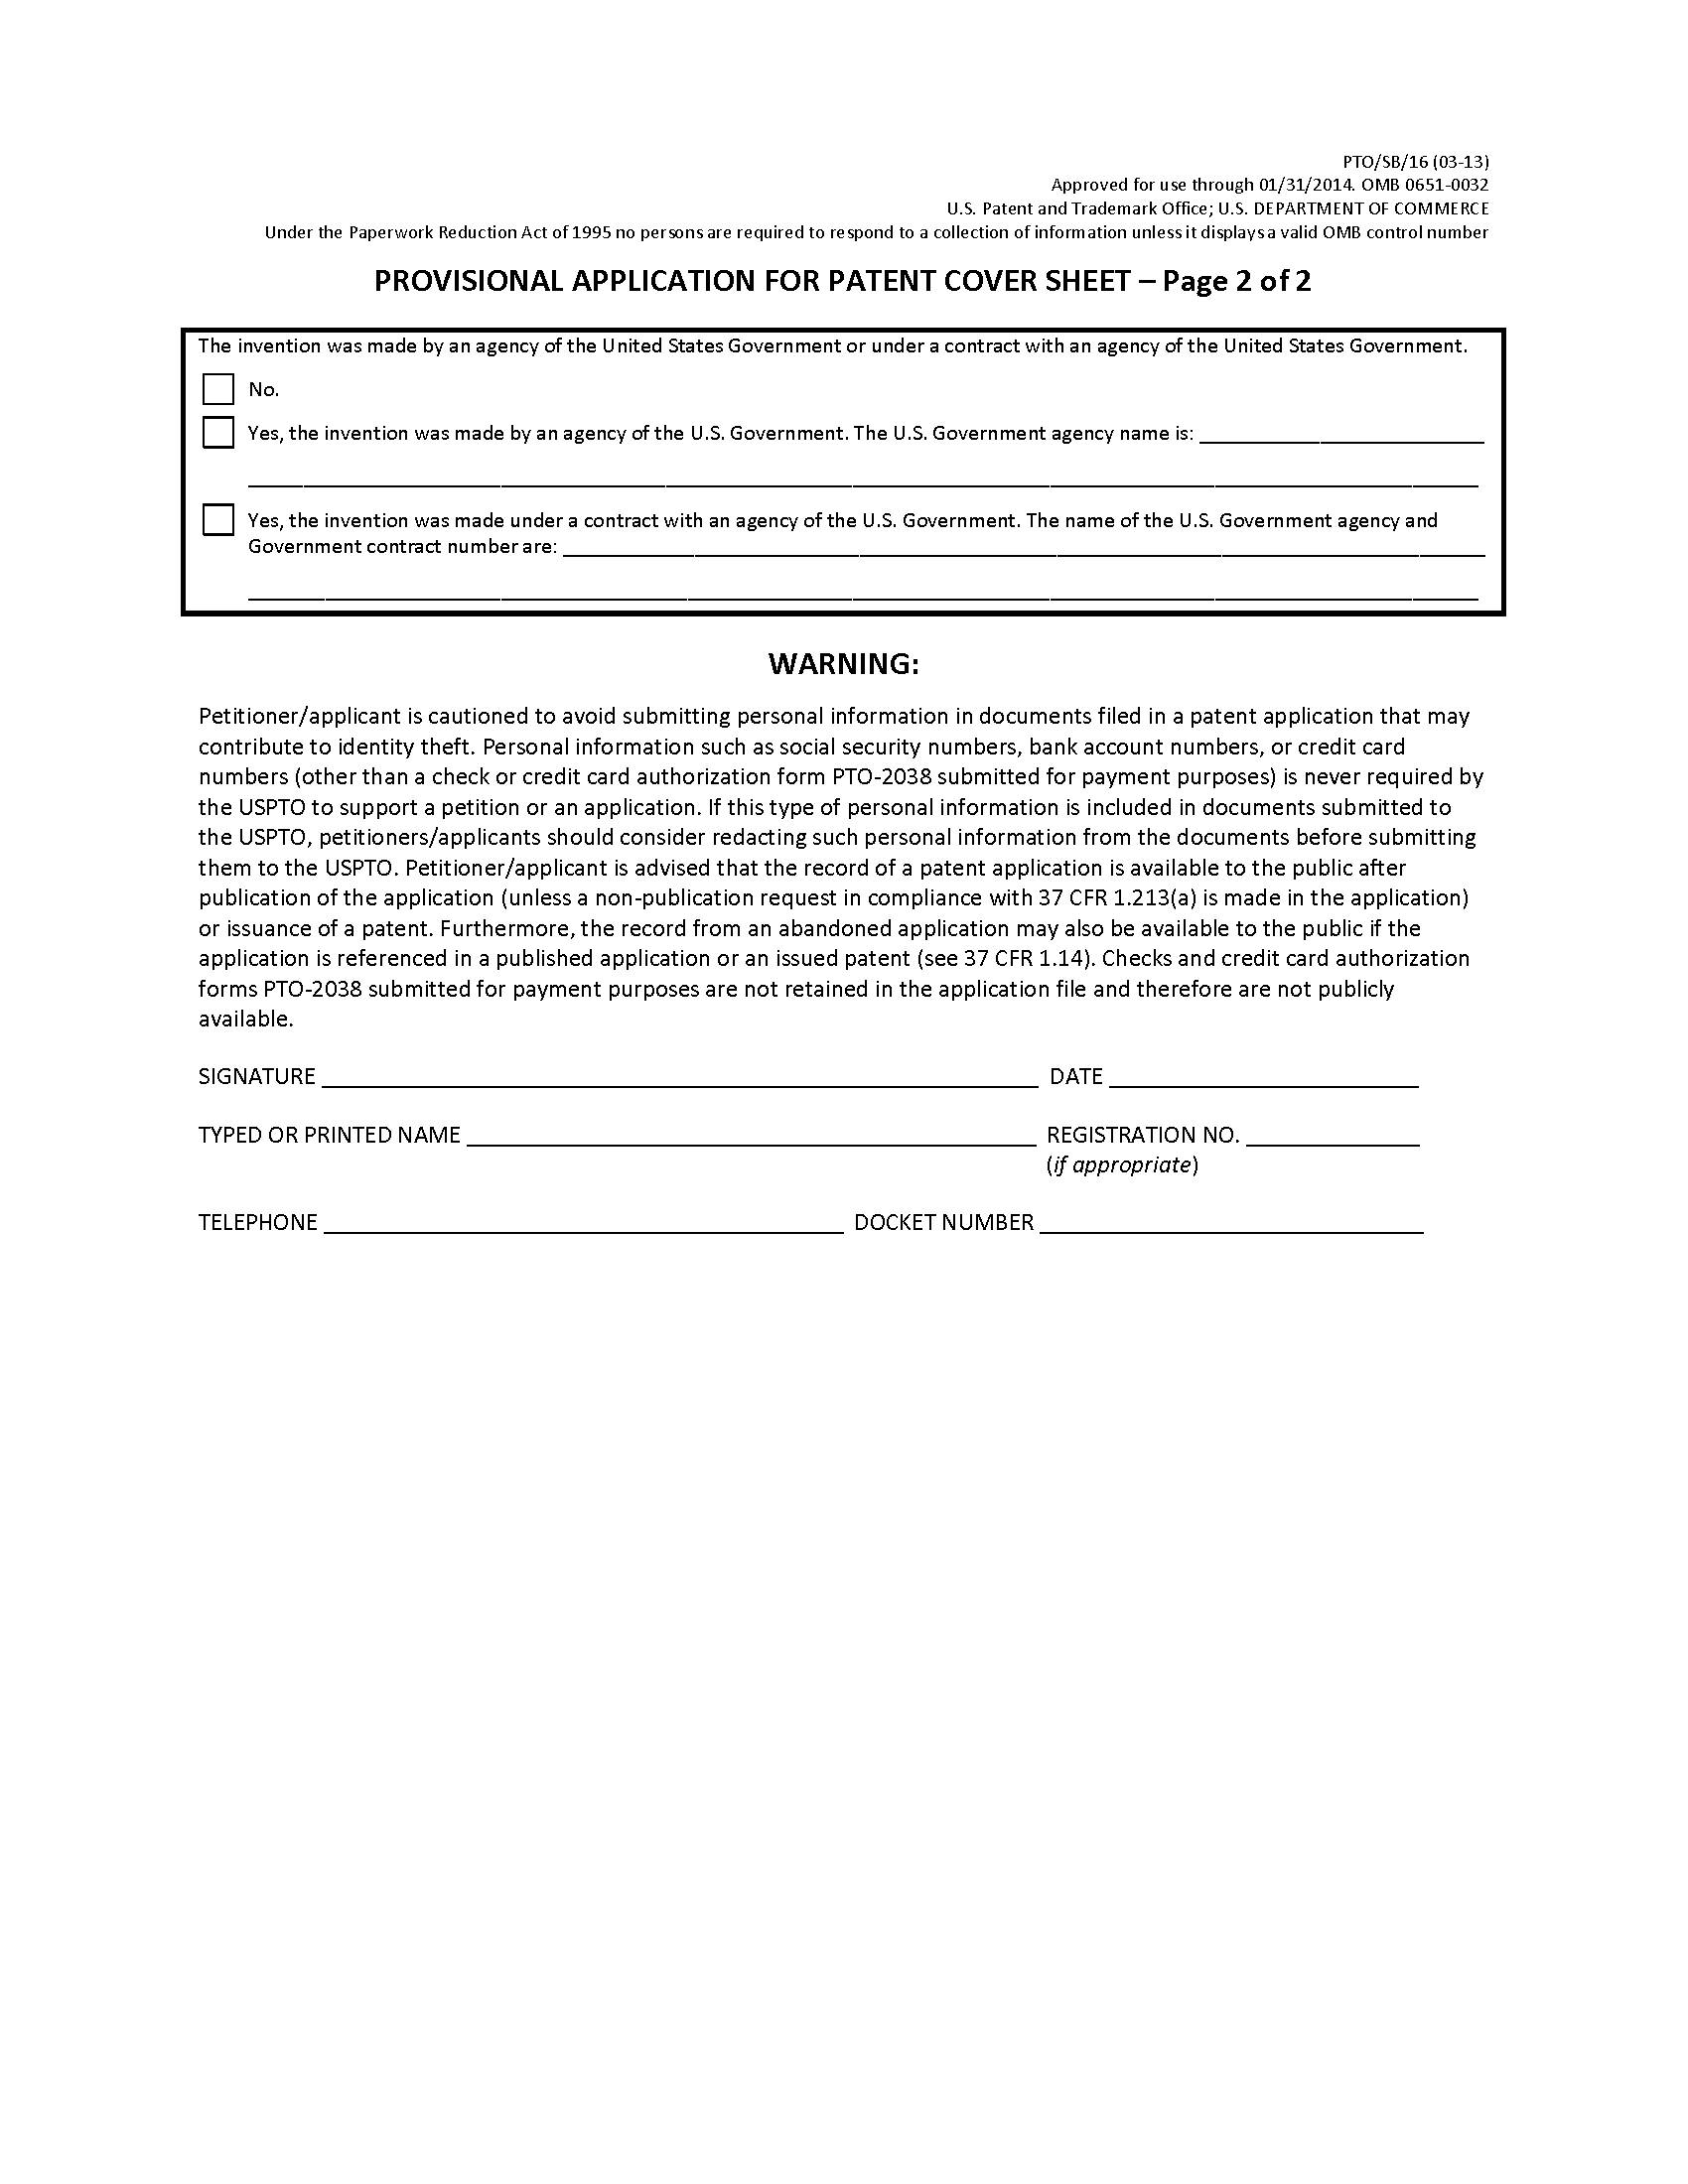 Provisional Patent Application Uspto